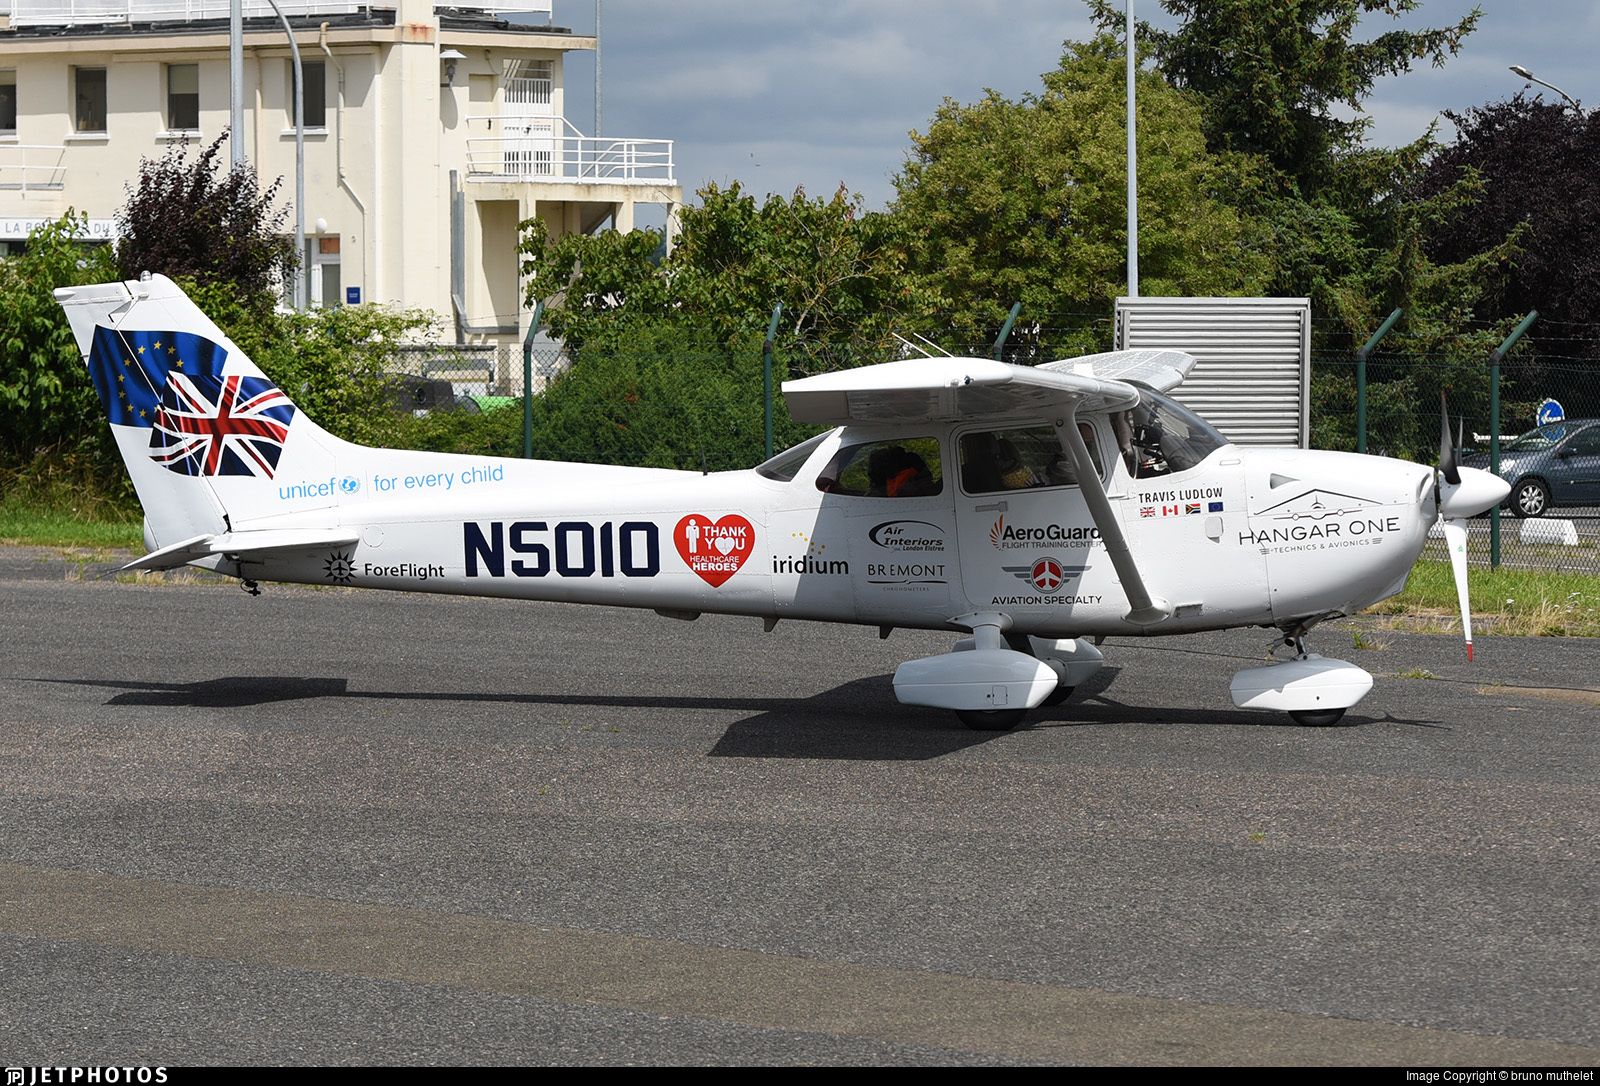 N5010 - Cessna 172R Skyhawk - Private